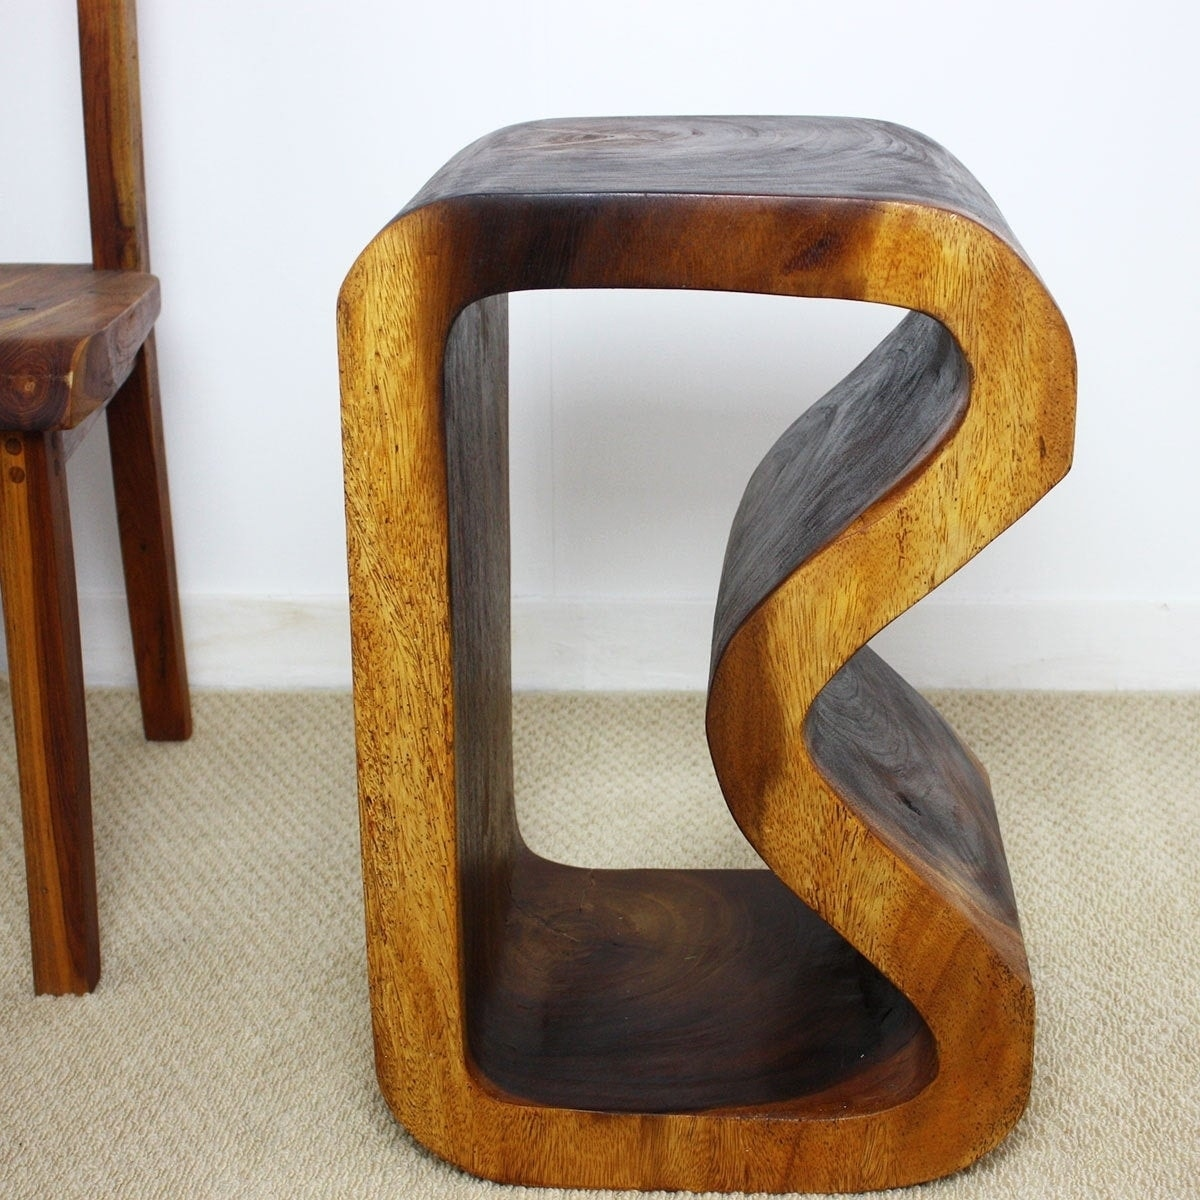 Haussmann Handmade 24 x 13.5 x 15 Walnut Oil Acacia Wood ...